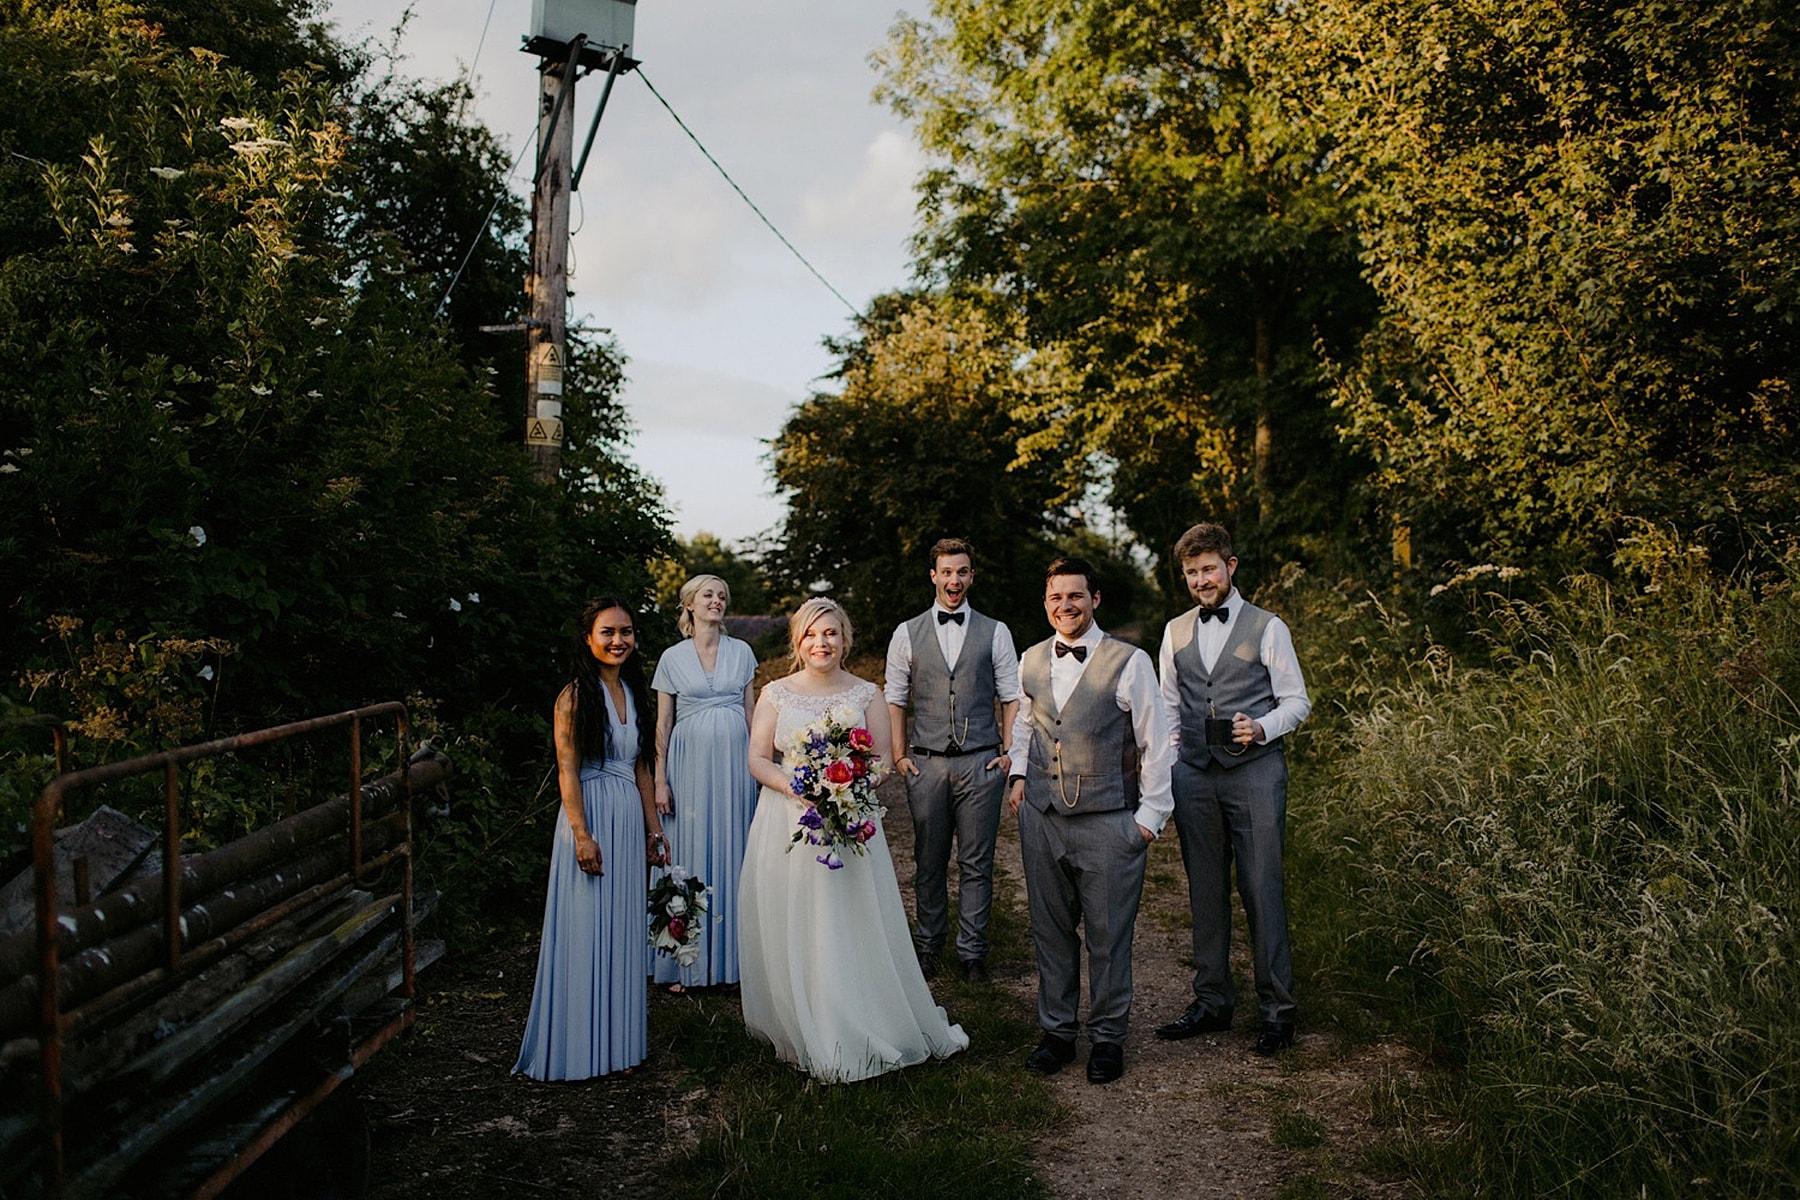 wedding at foxton locks inn old boathouse